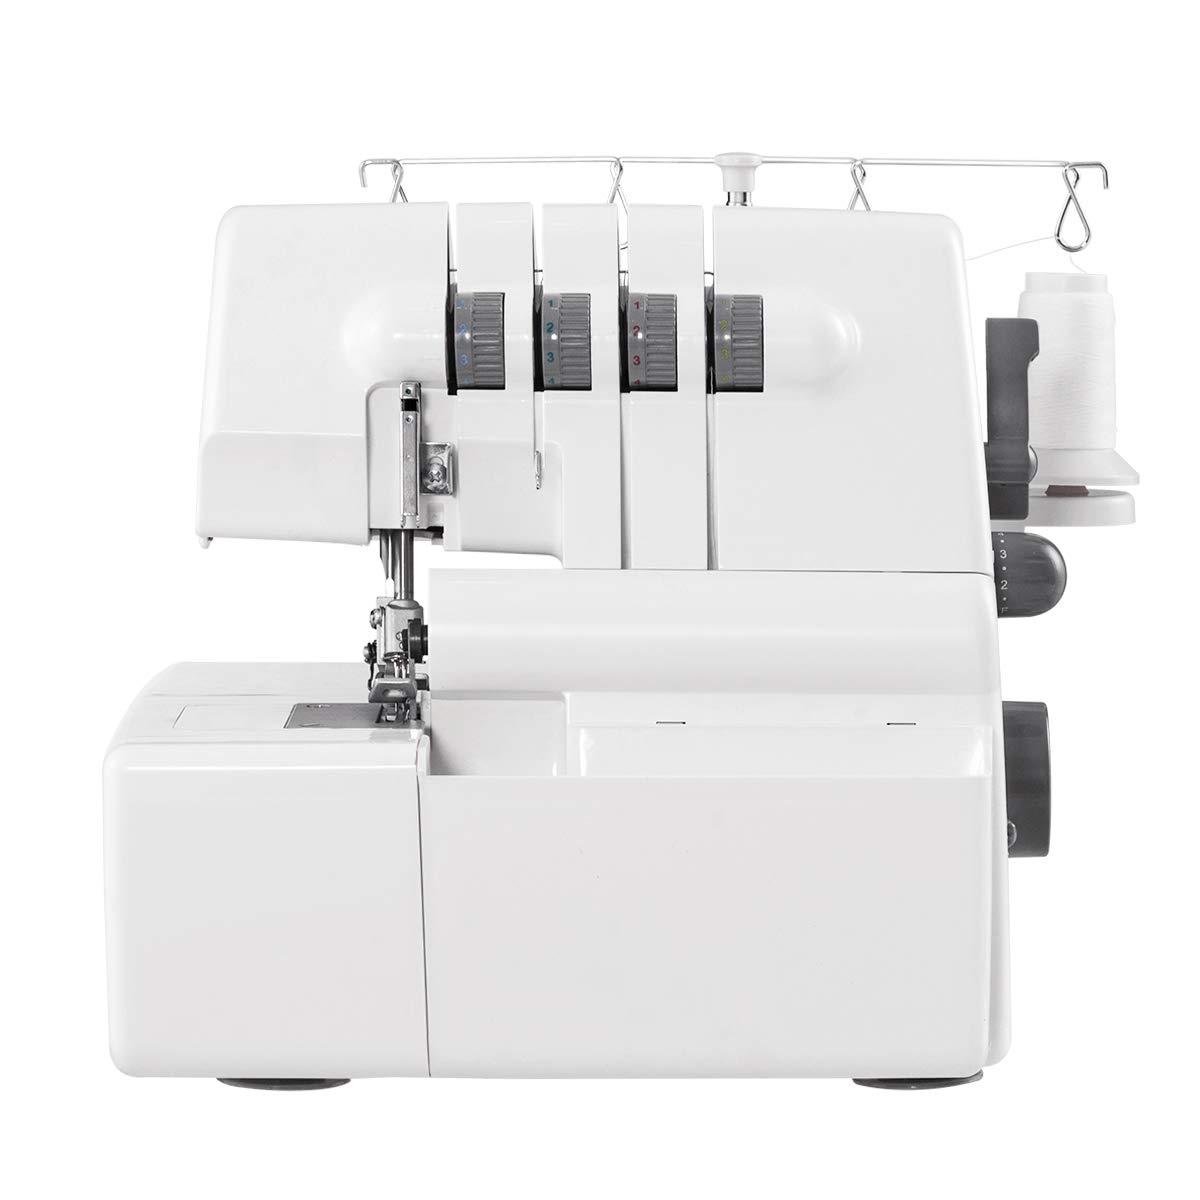 COSTWAY Portable Multifunctional Serger Sewing Machine Image